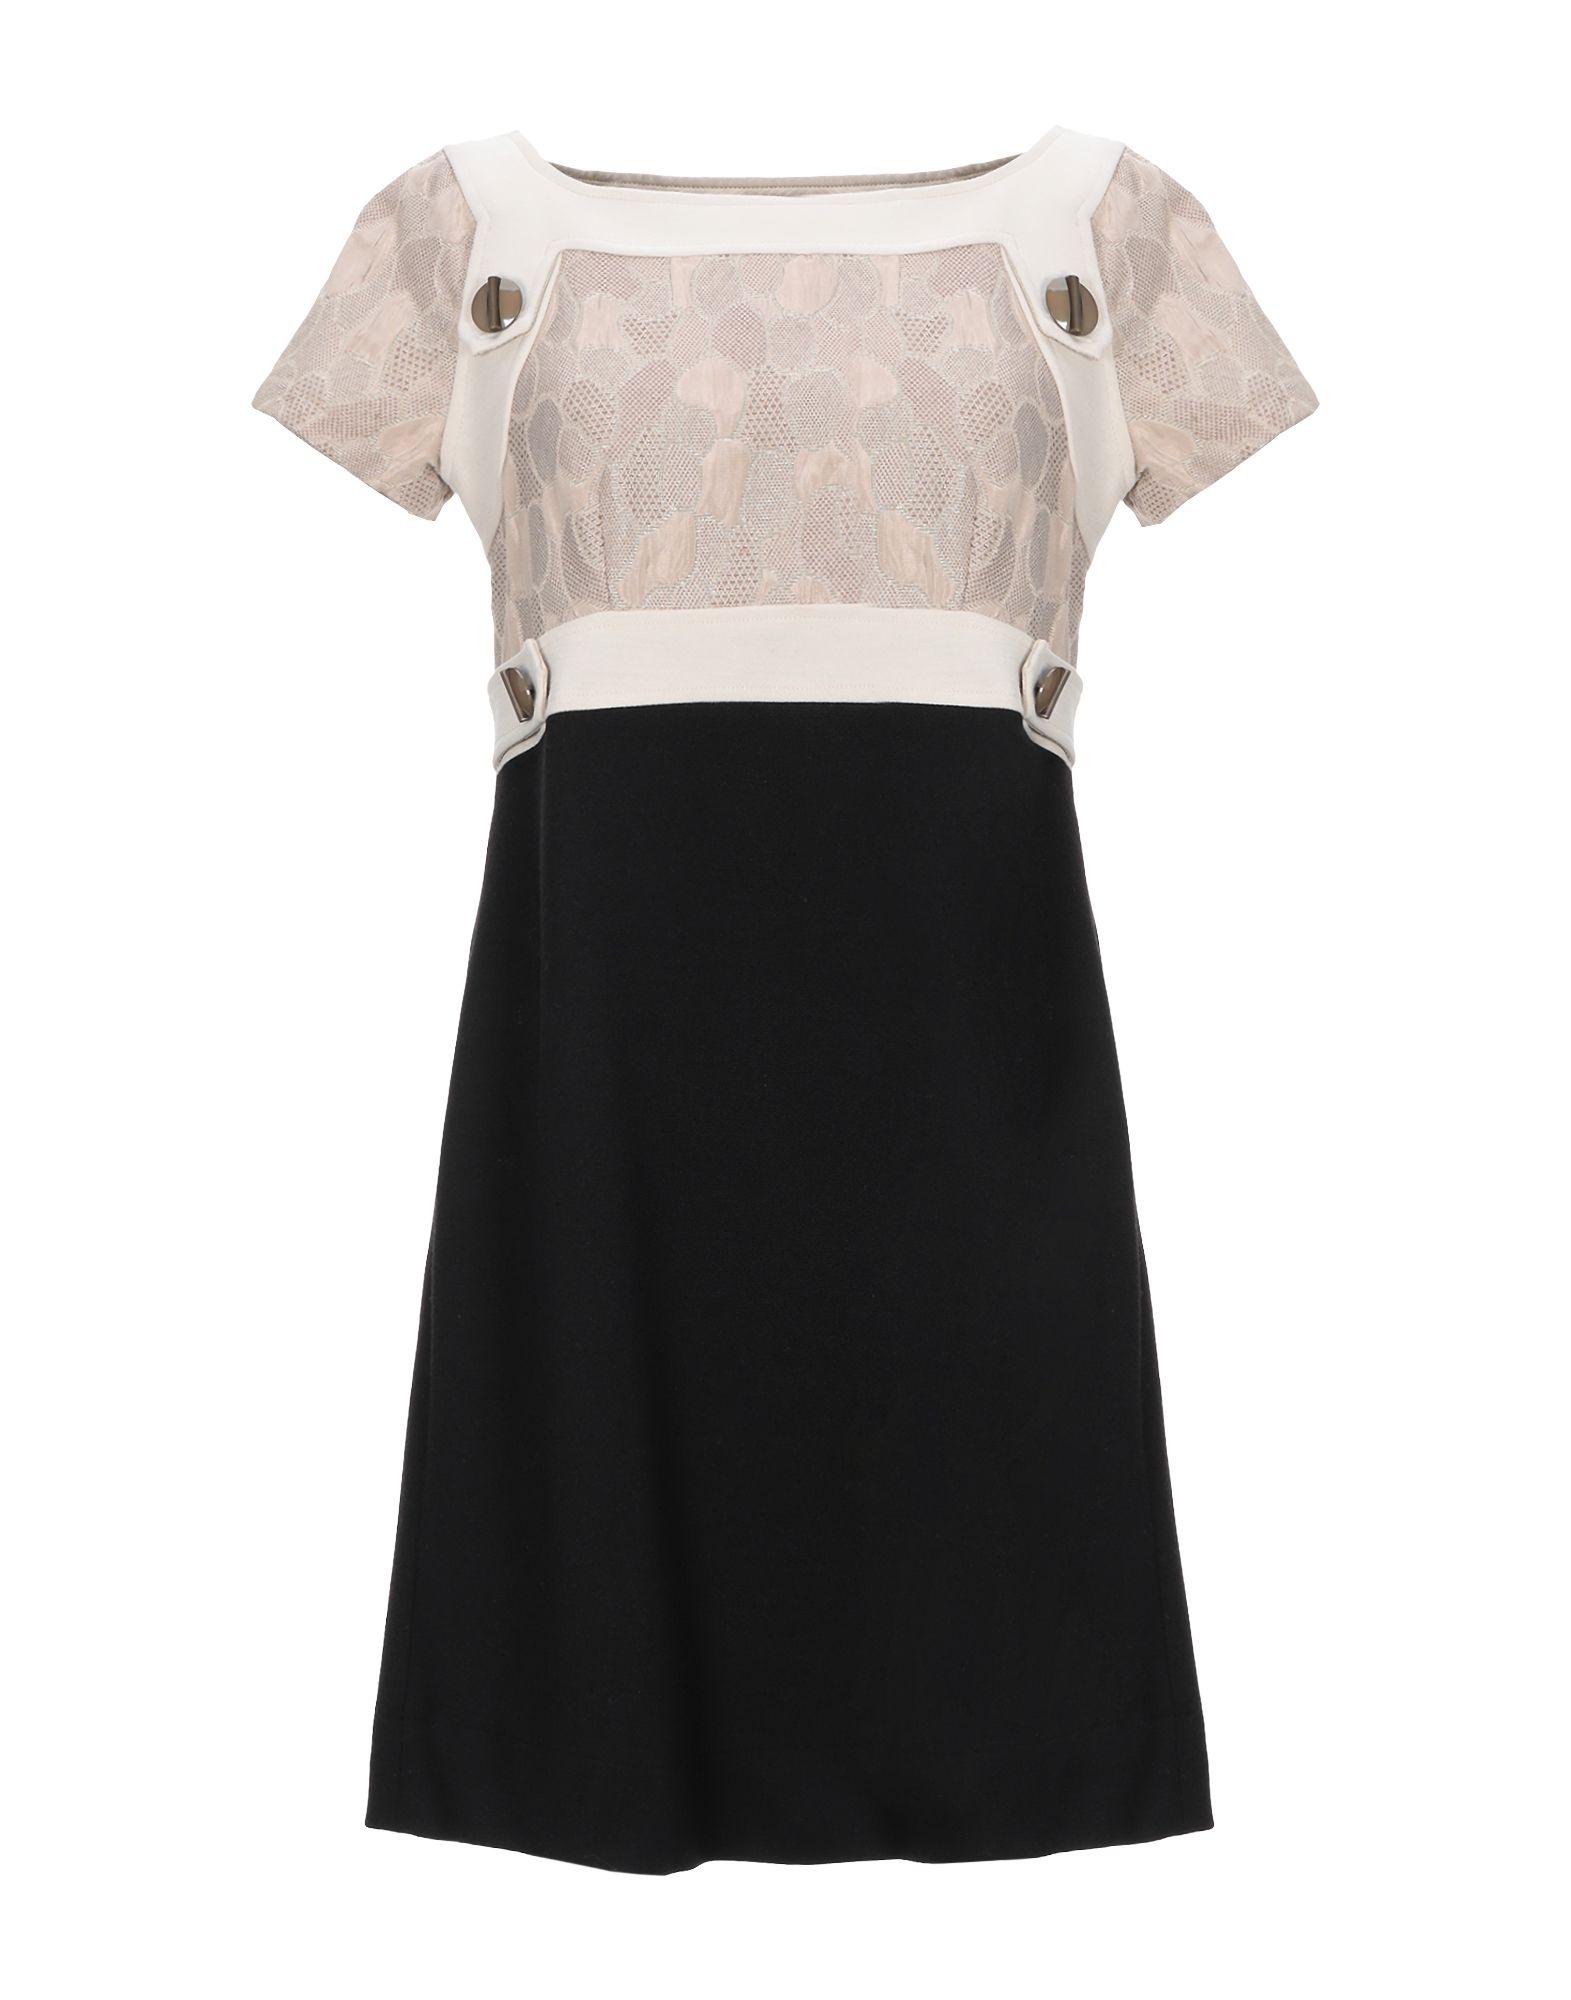 ALICE SAN DIEGO Короткое платье alice san diego блузка